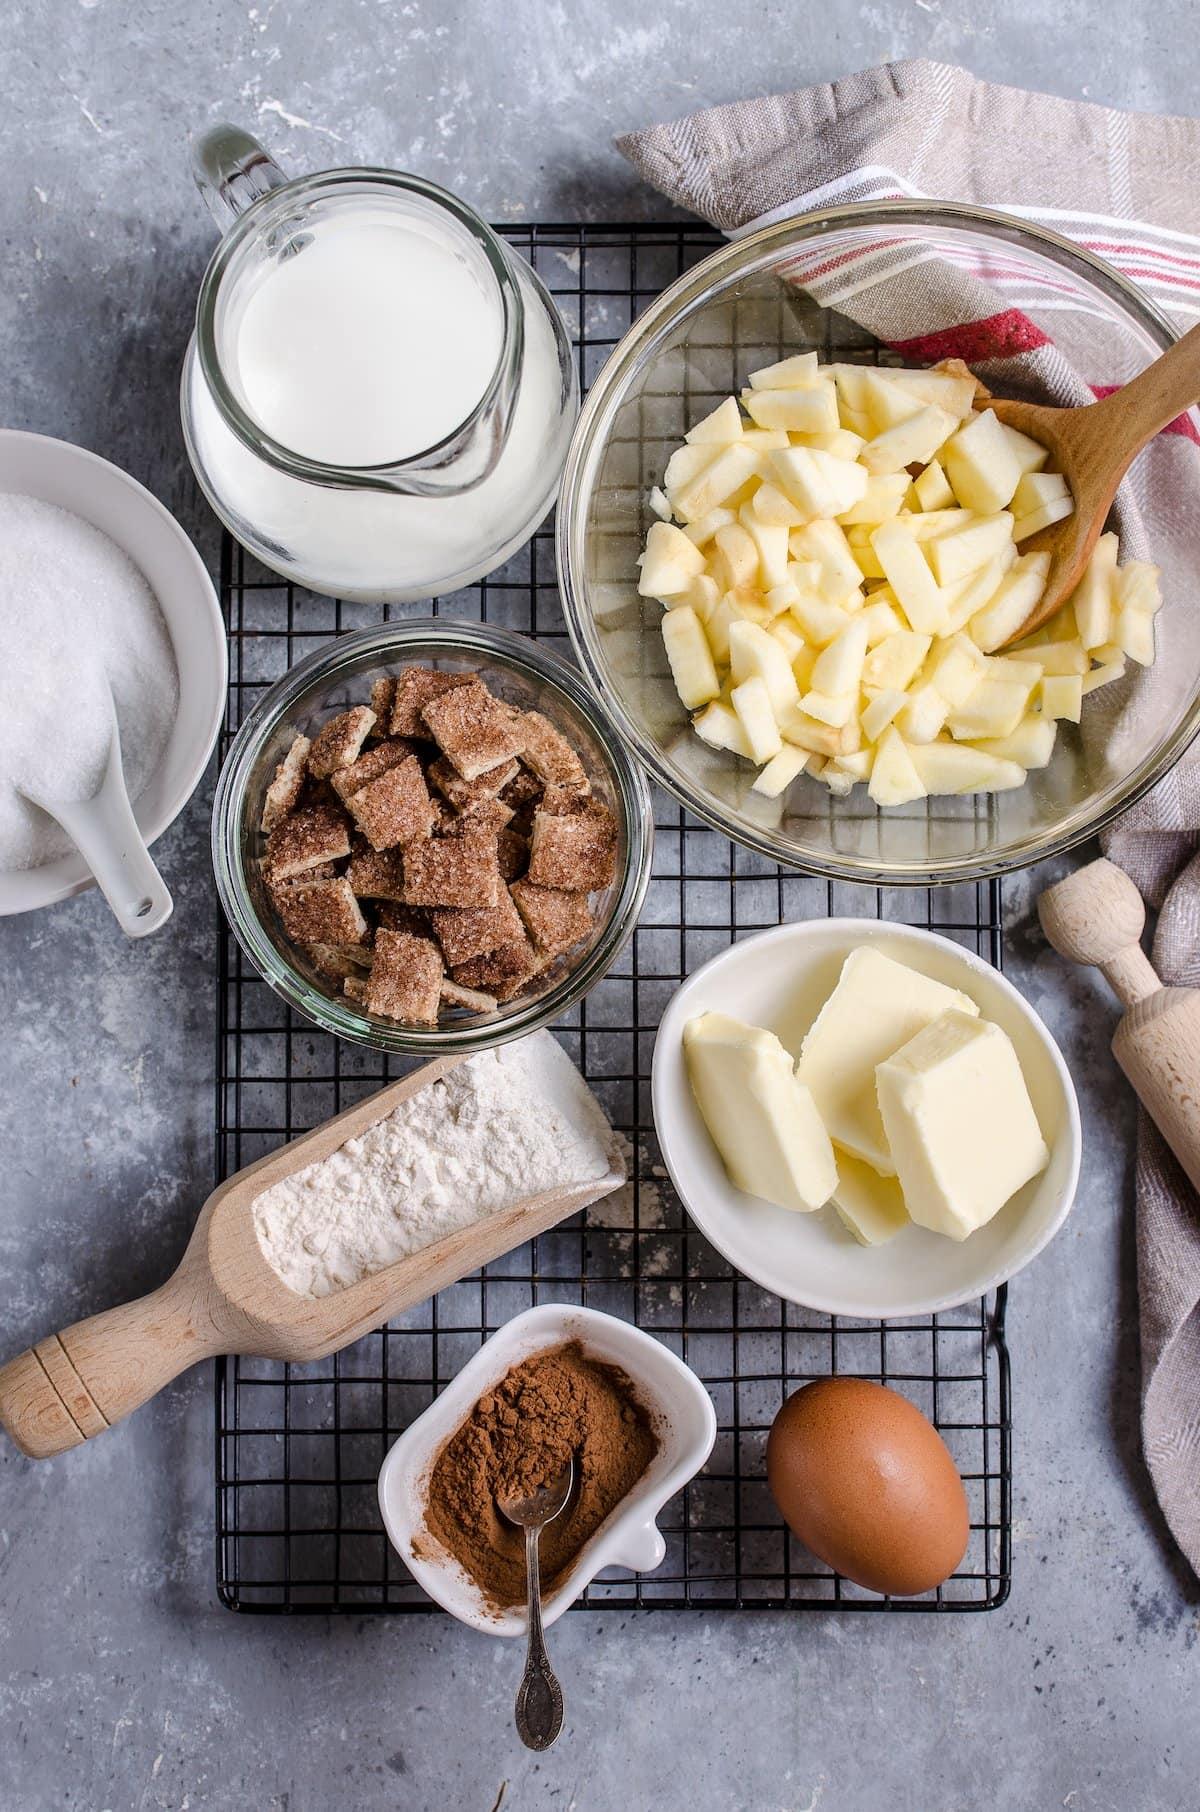 Ingredients for apple pie bars.